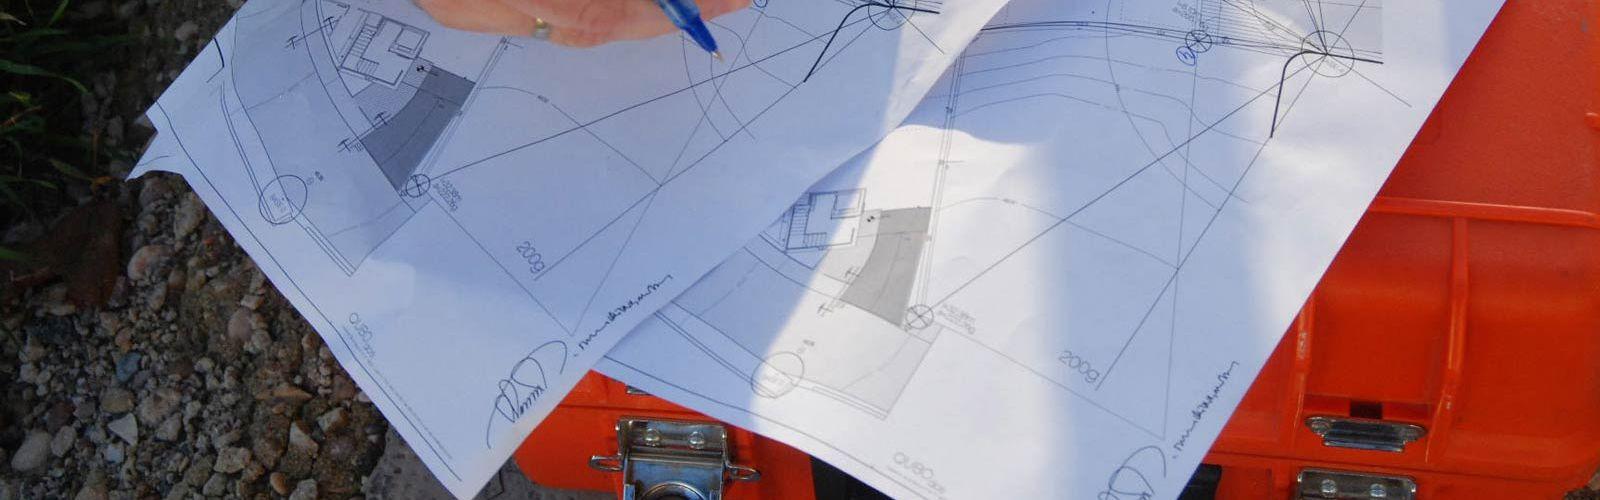 02topografia-ingeniero_agronomo_cuenca